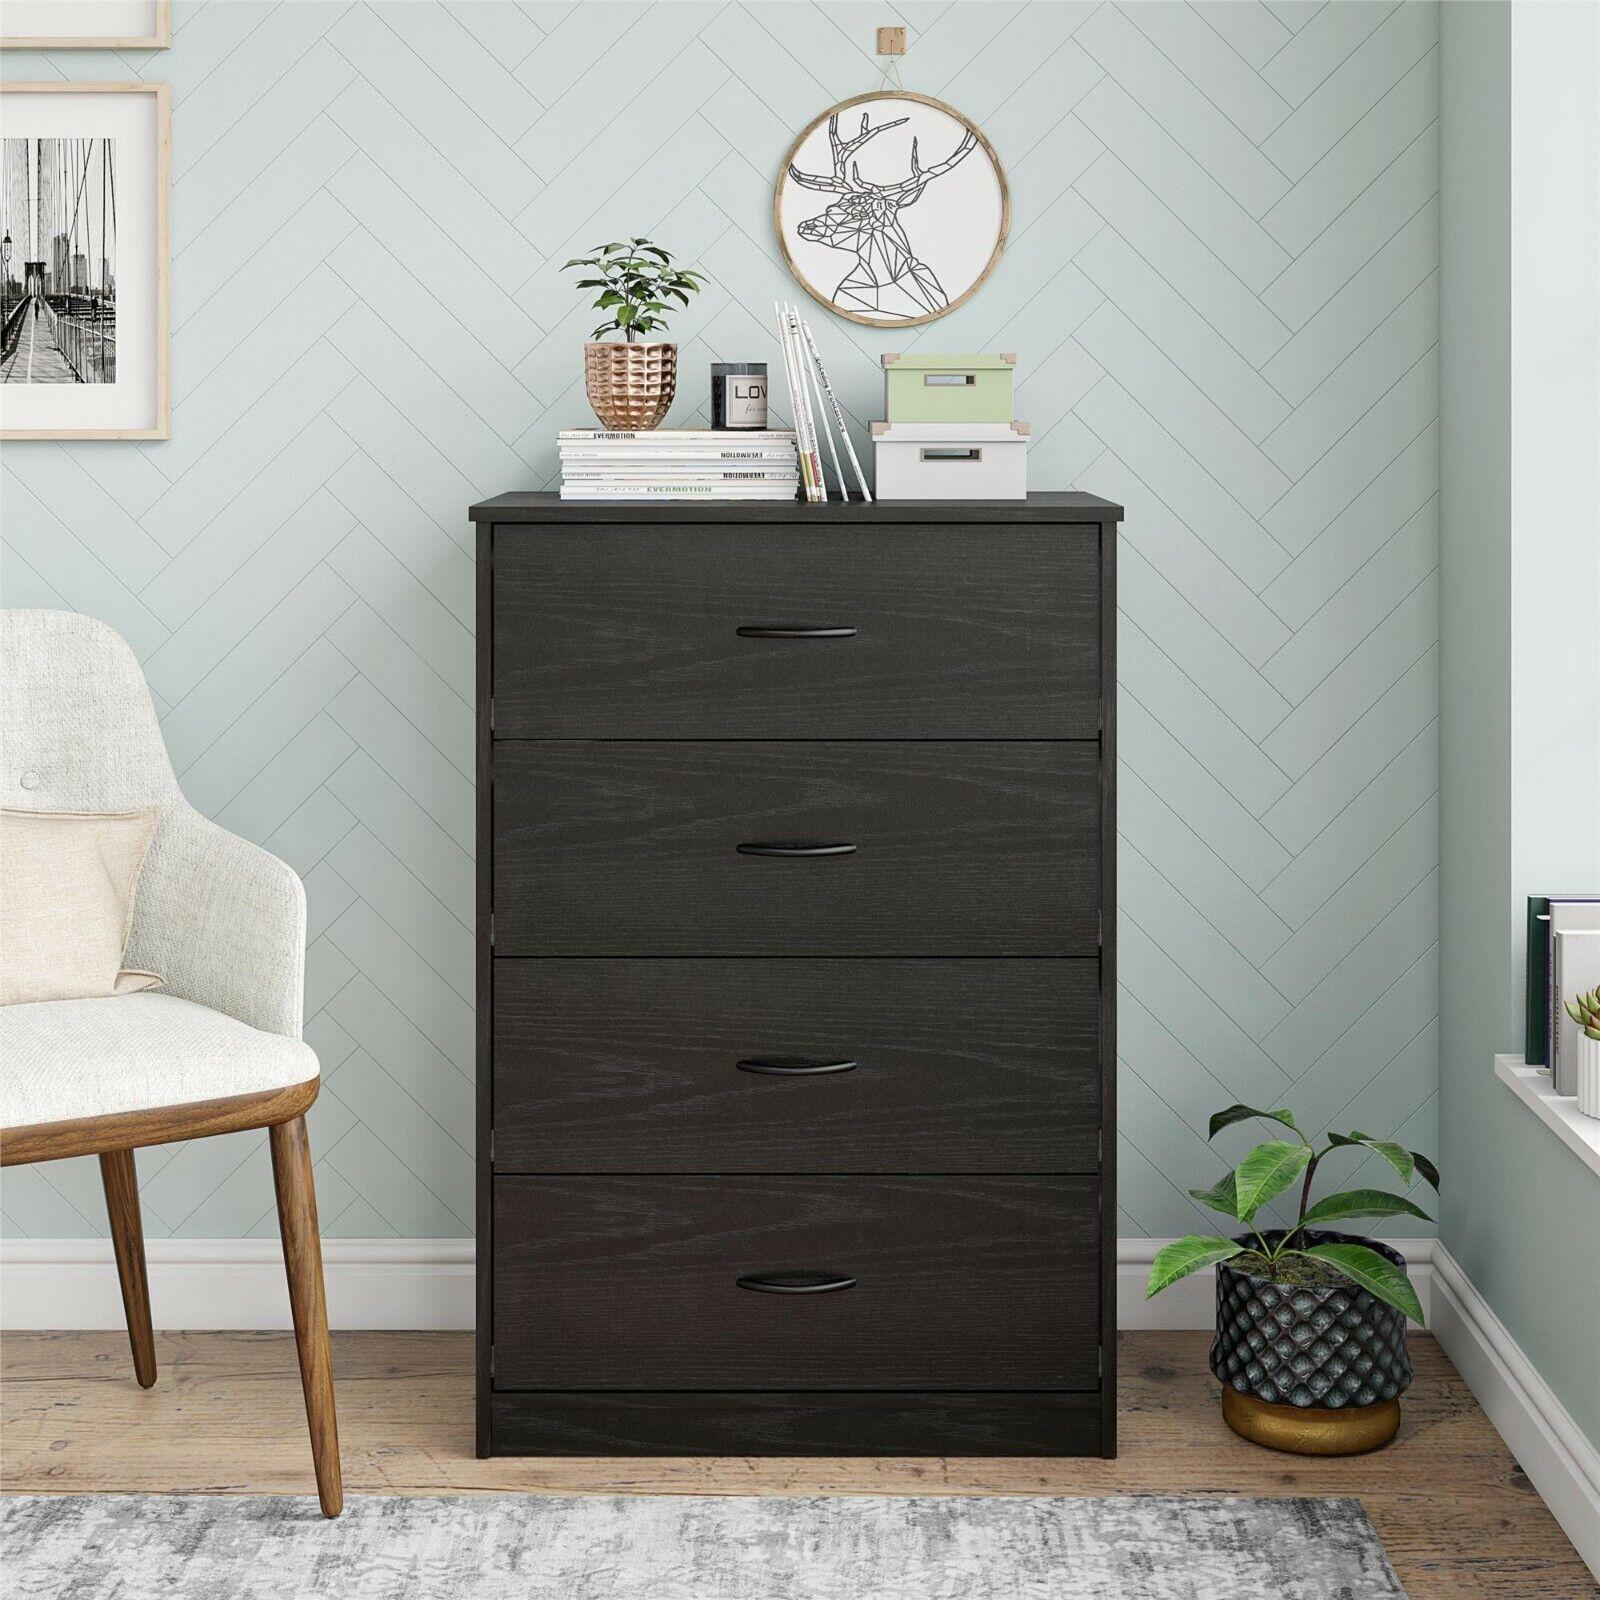 Sealy Batavia 4 Drawer Transitional Rta Dresser White Pattern For Sale Online Ebay